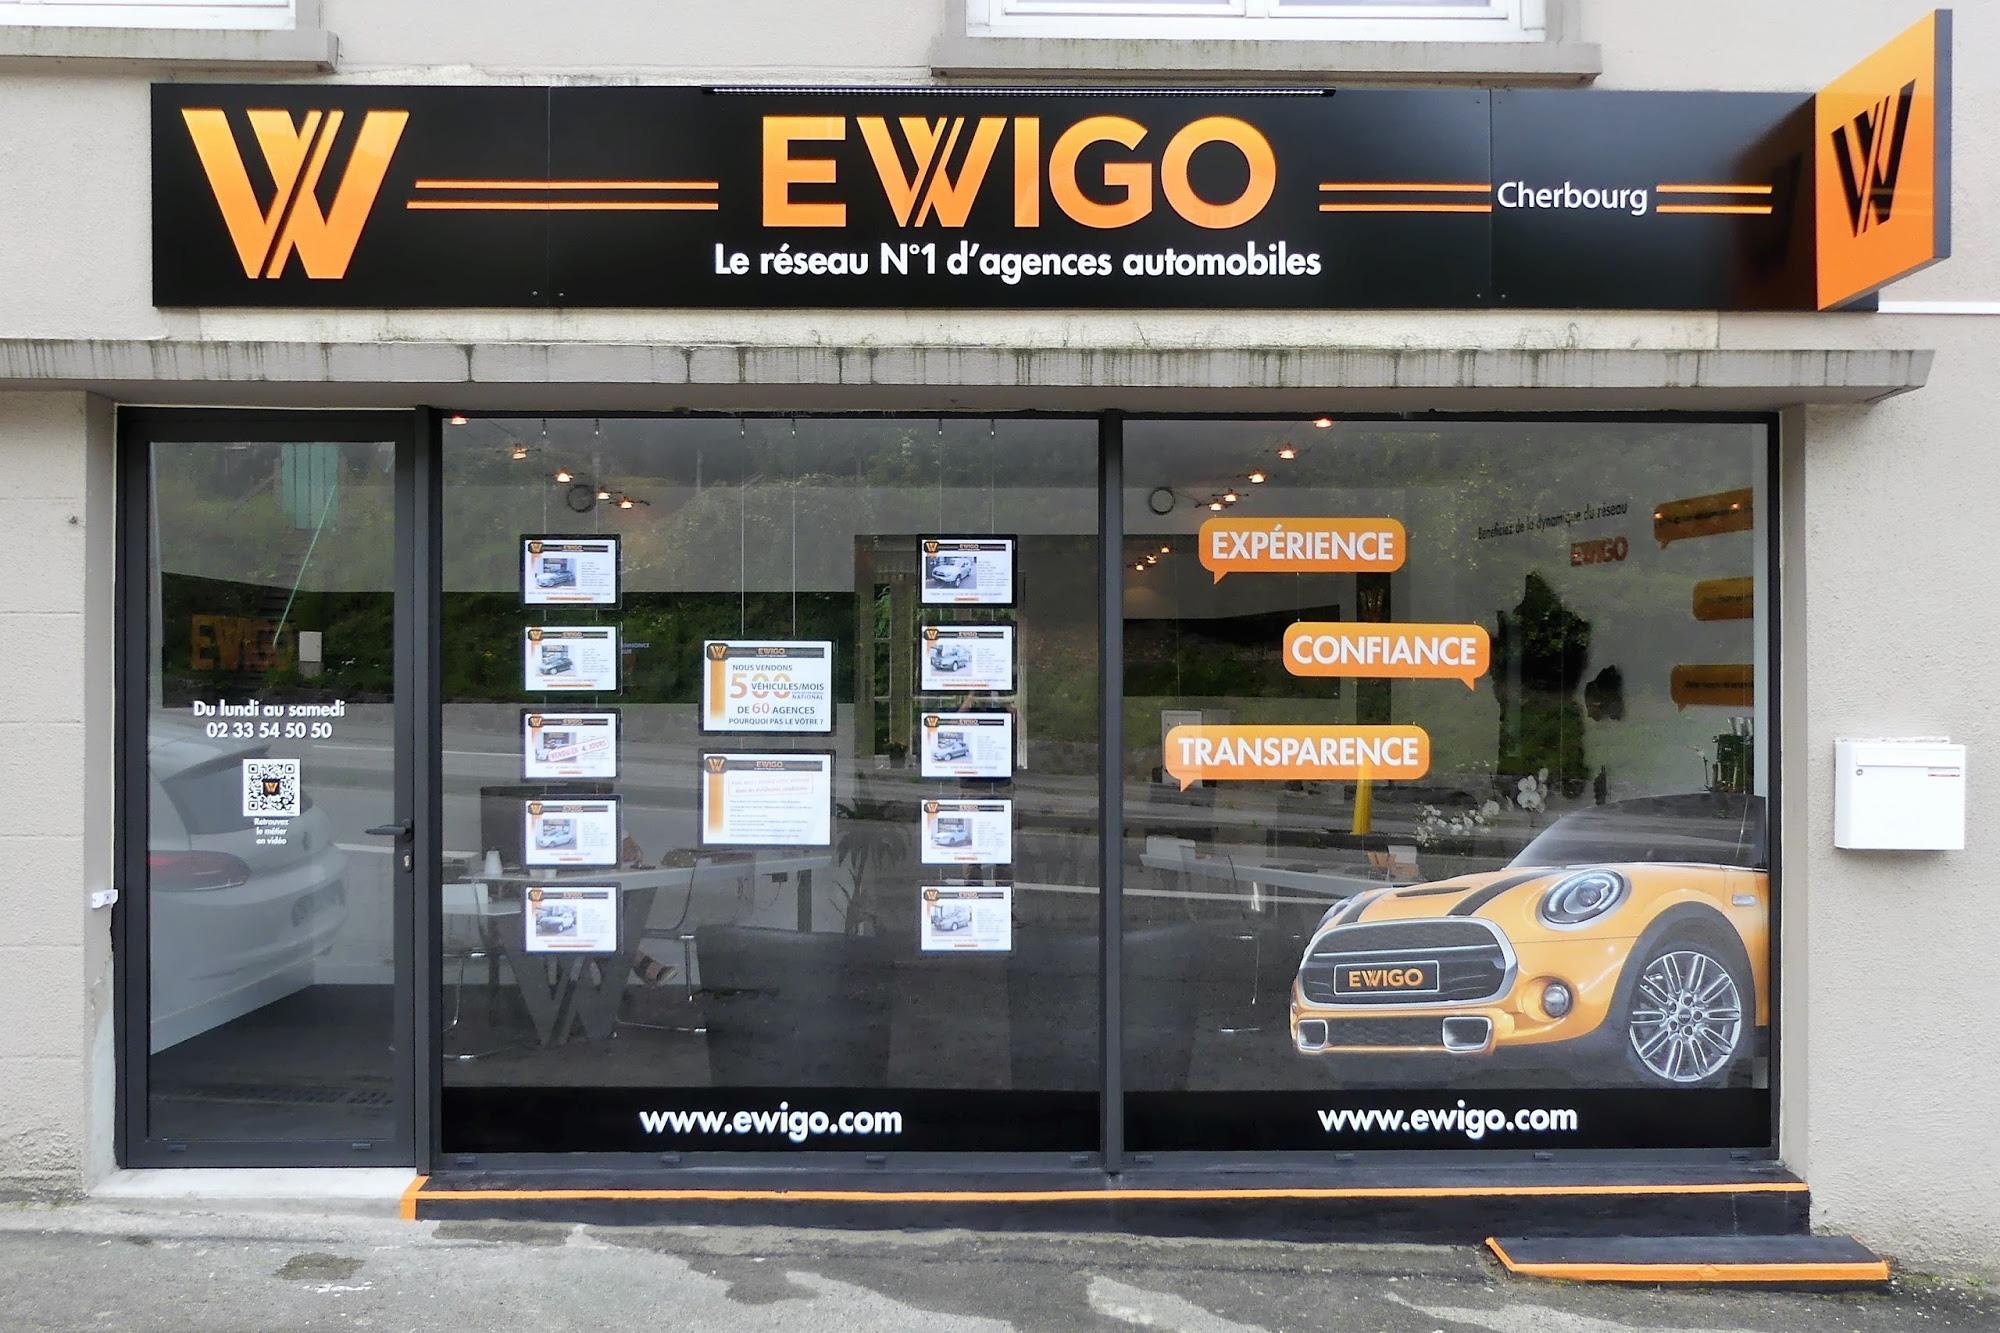 Ewigo Cherbourg CHERBOURG-EN-COTENTIN 3